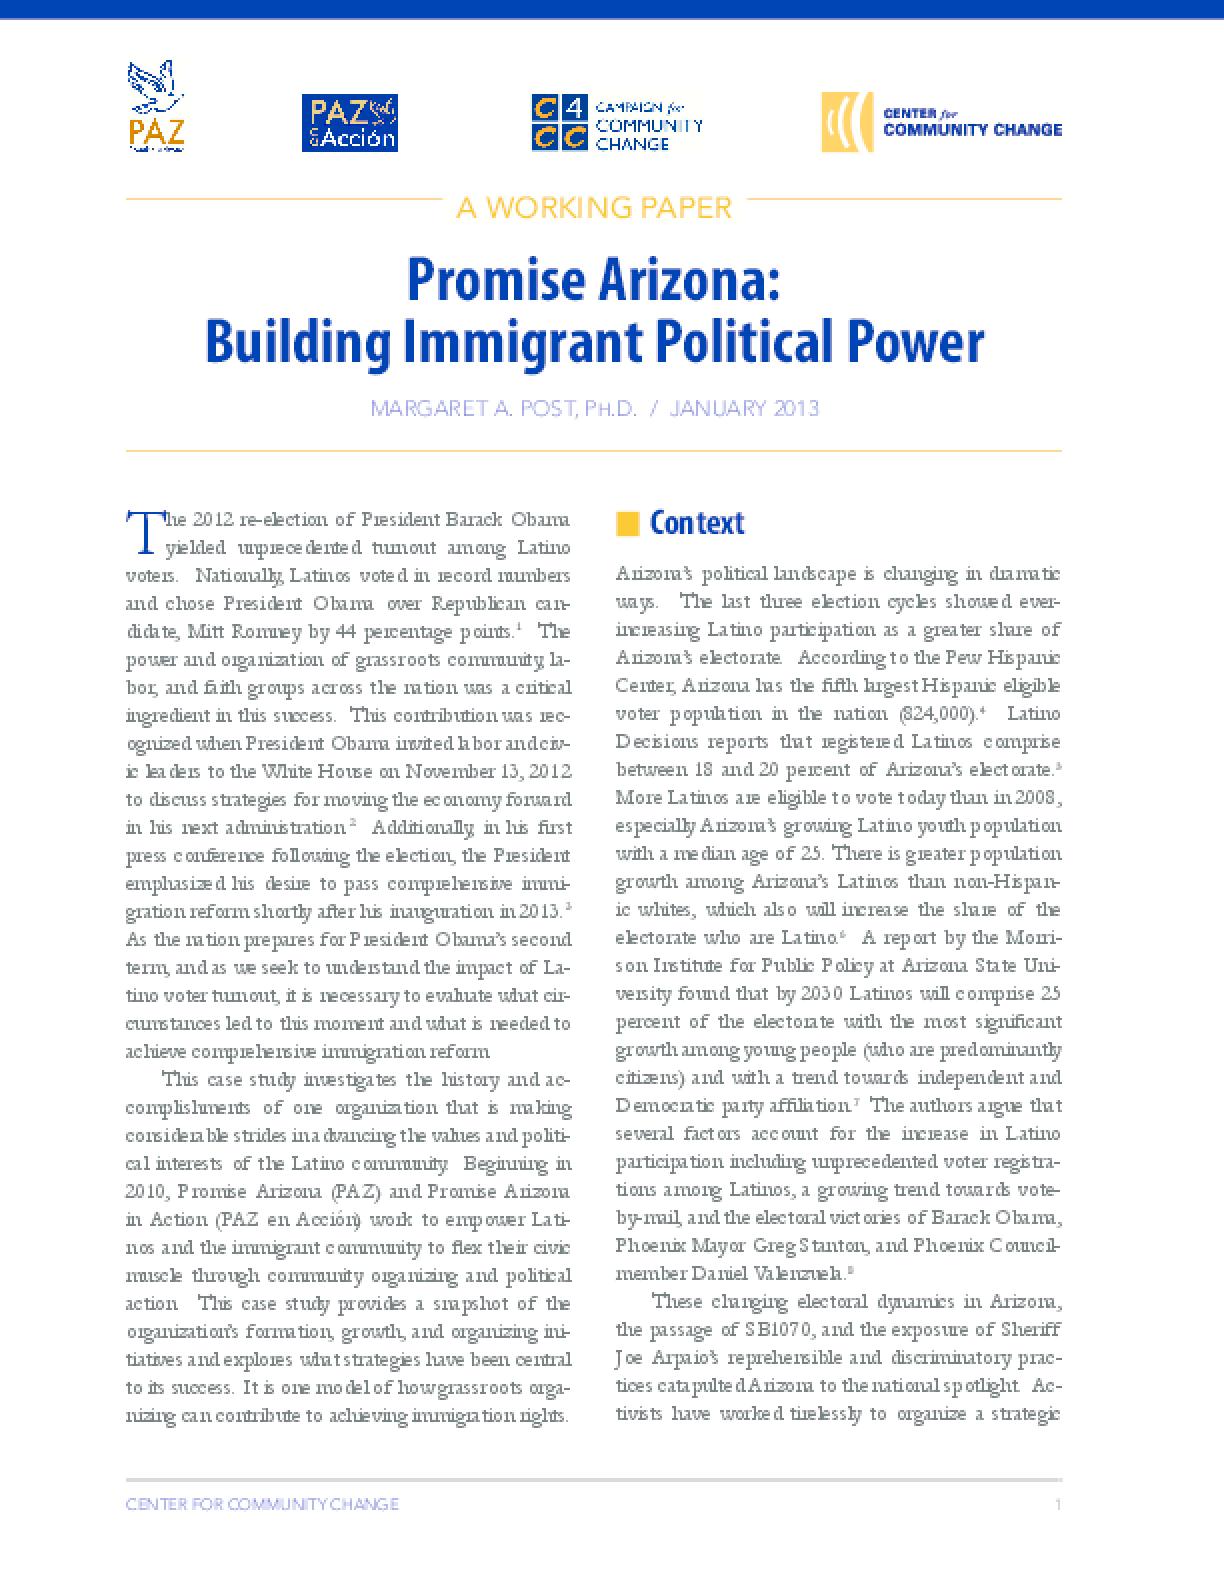 Promise Arizona: Building Immigrant Political Power